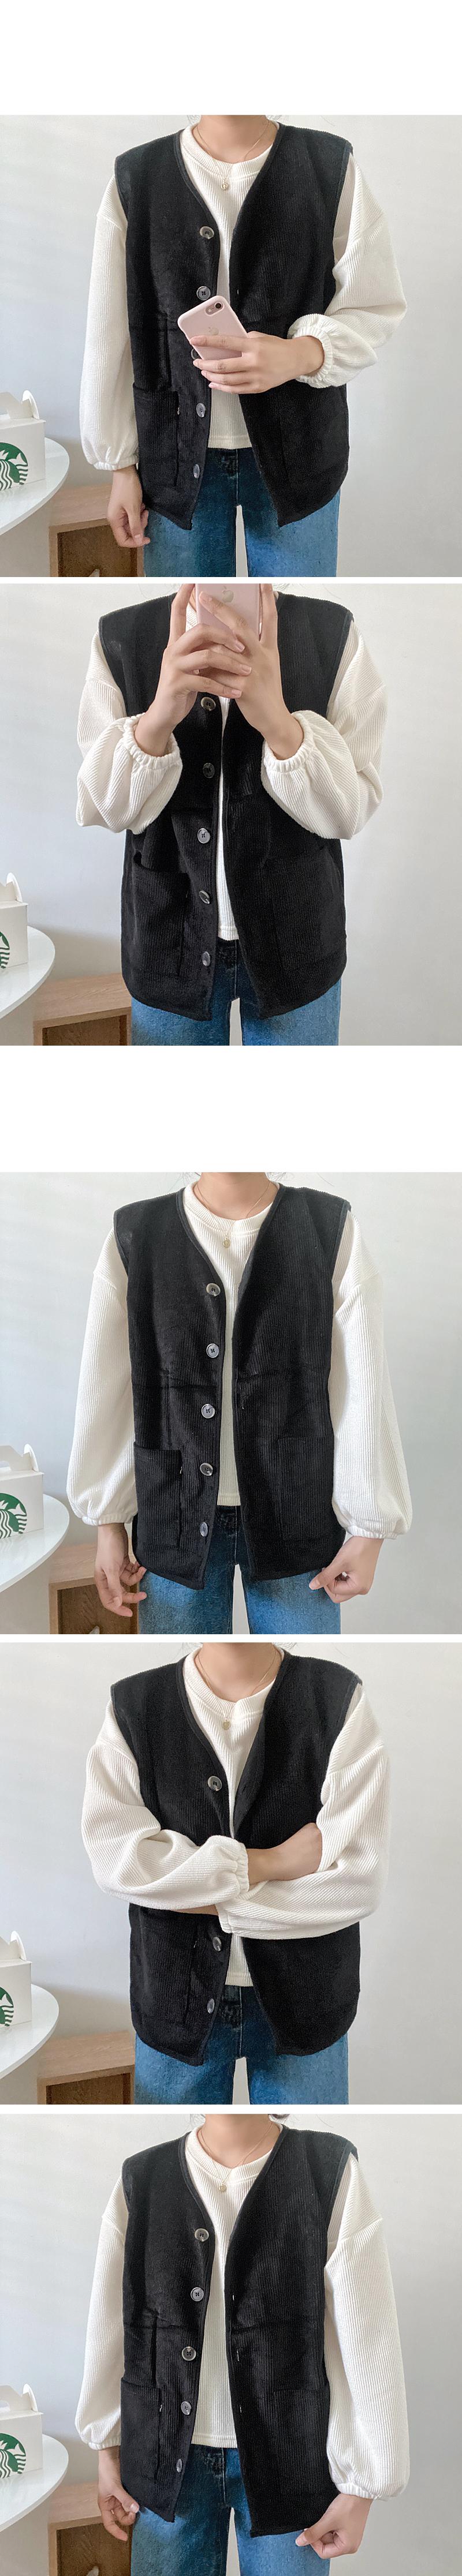 Izu Corduroy Vest